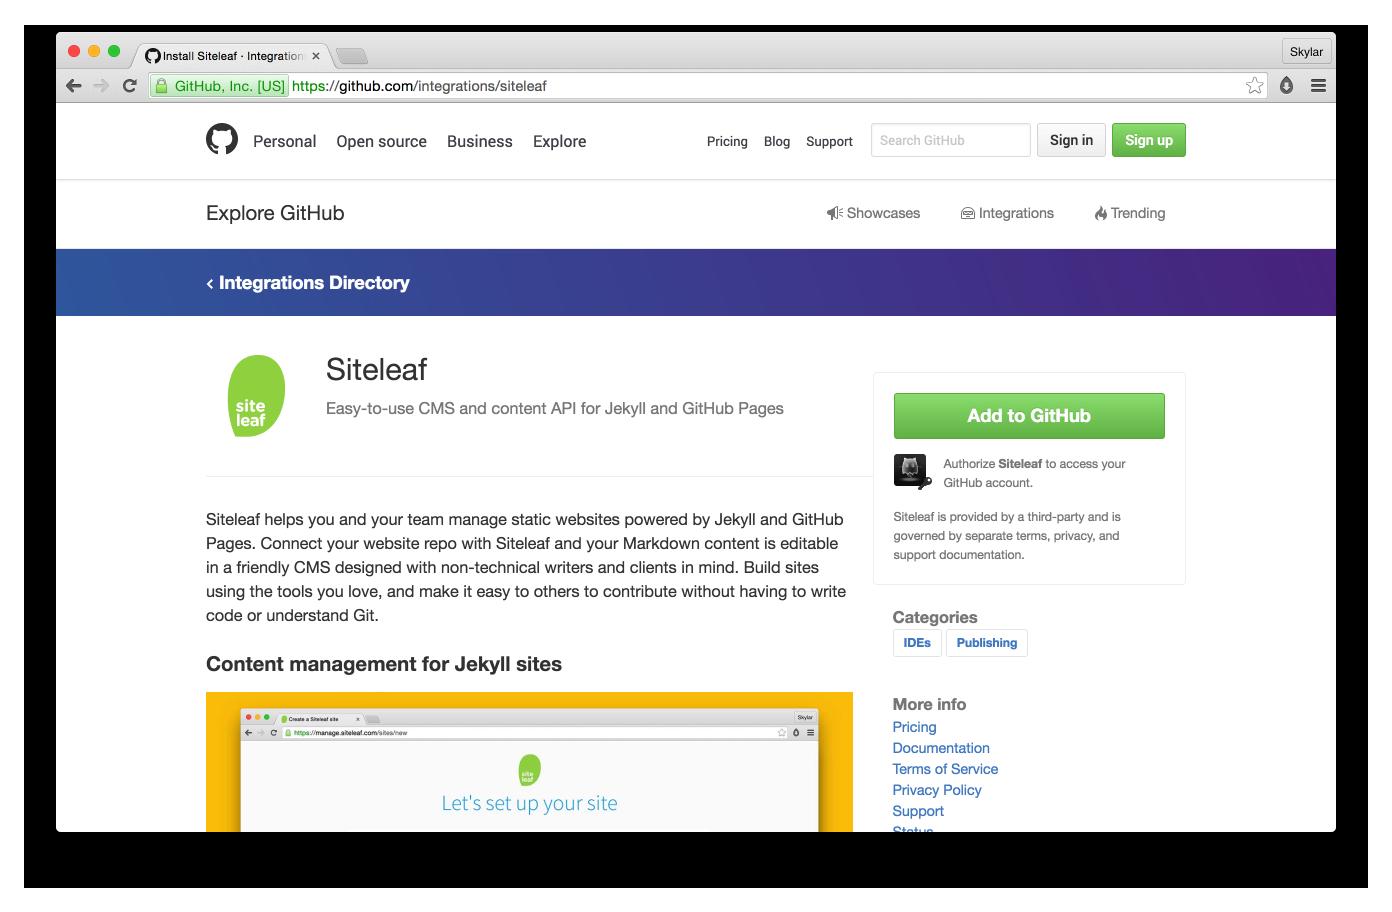 GitHub Integrations Directory - Siteleaf